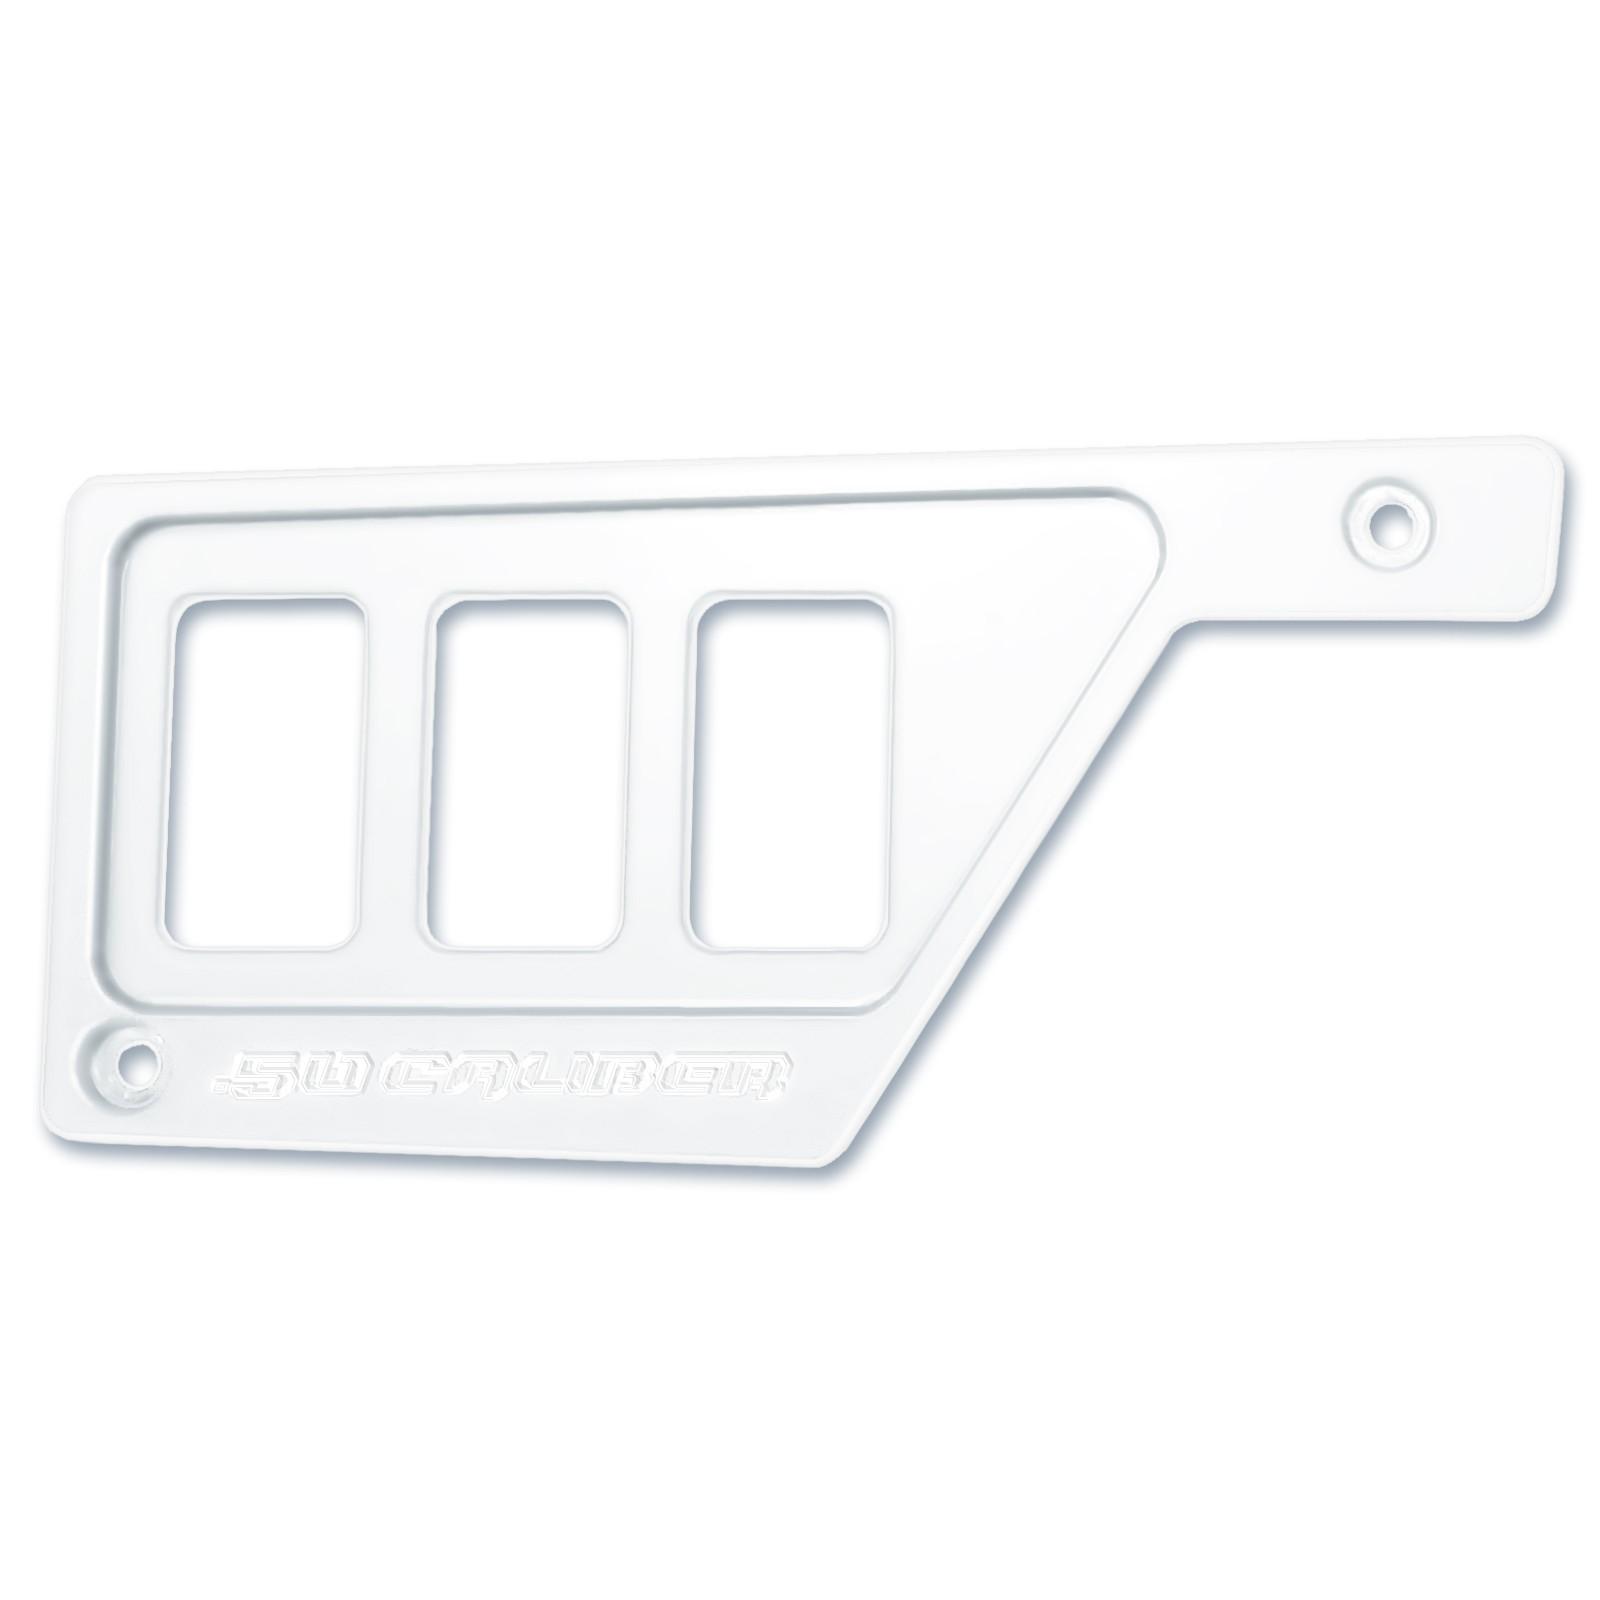 Left Dash Switch Panel Plate Bezel Polaris Rzr Xp 900